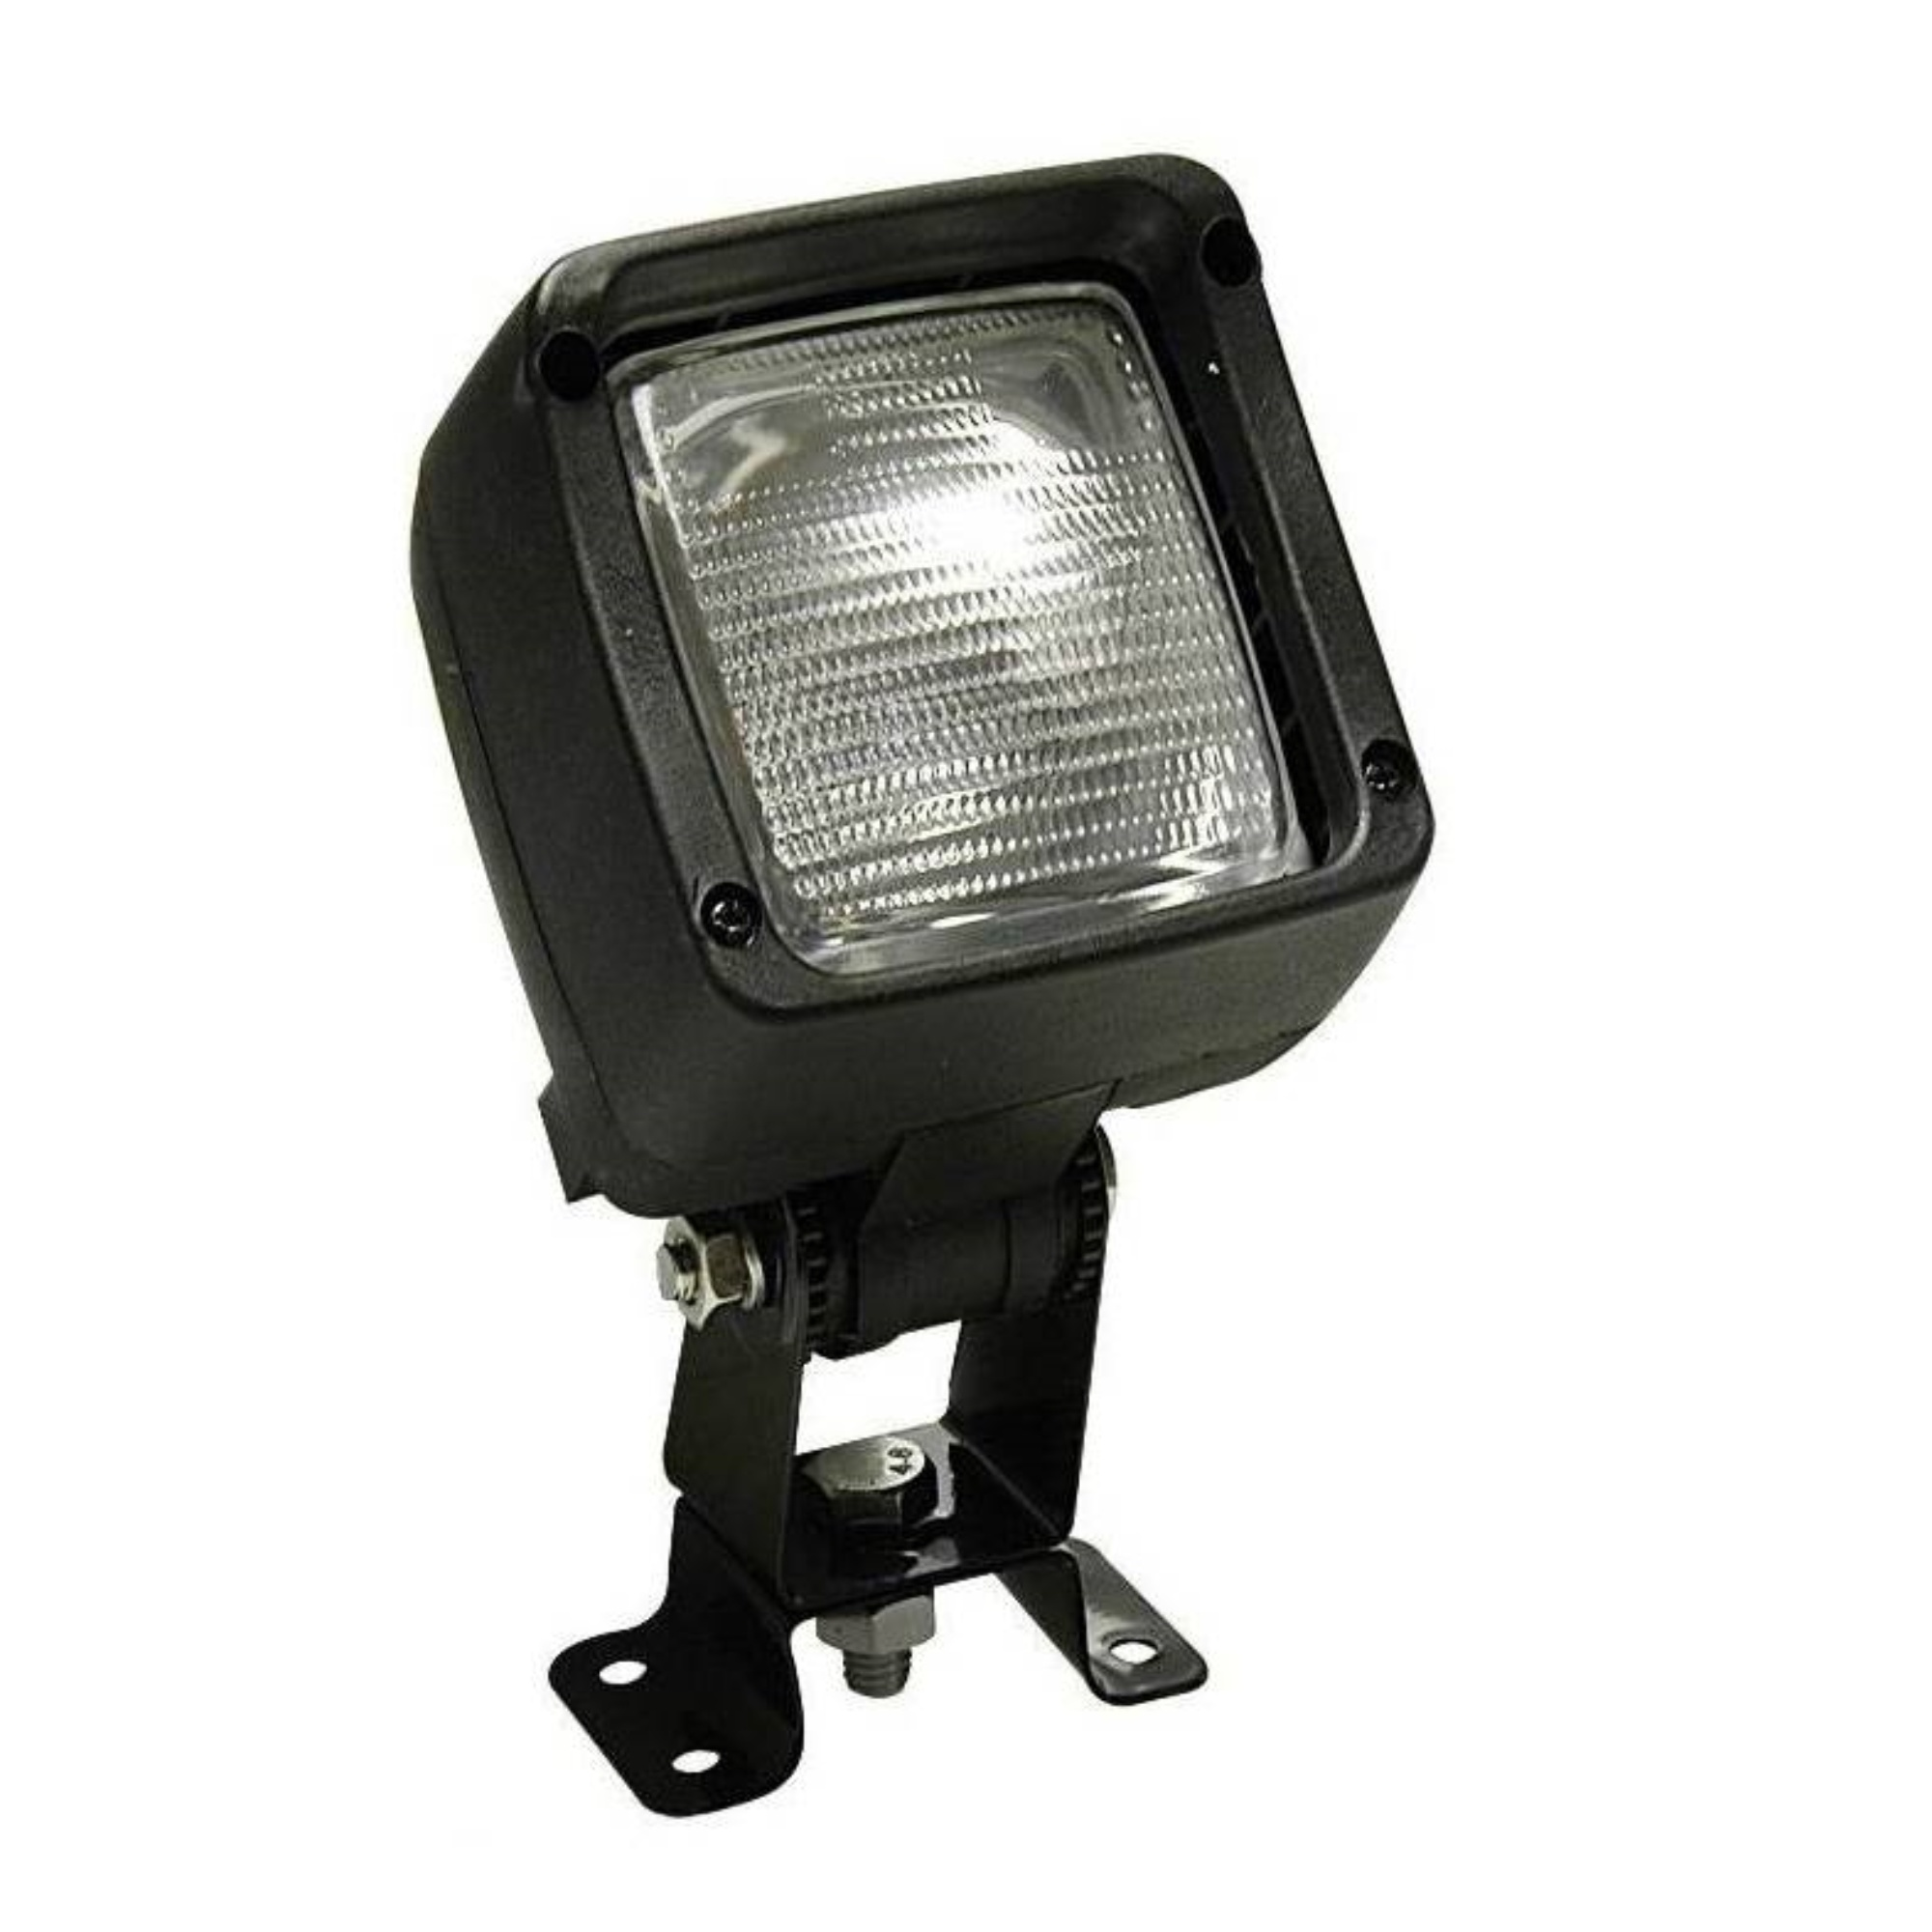 Werklamp Enkel 105X95 mm H3-12V incl Voet